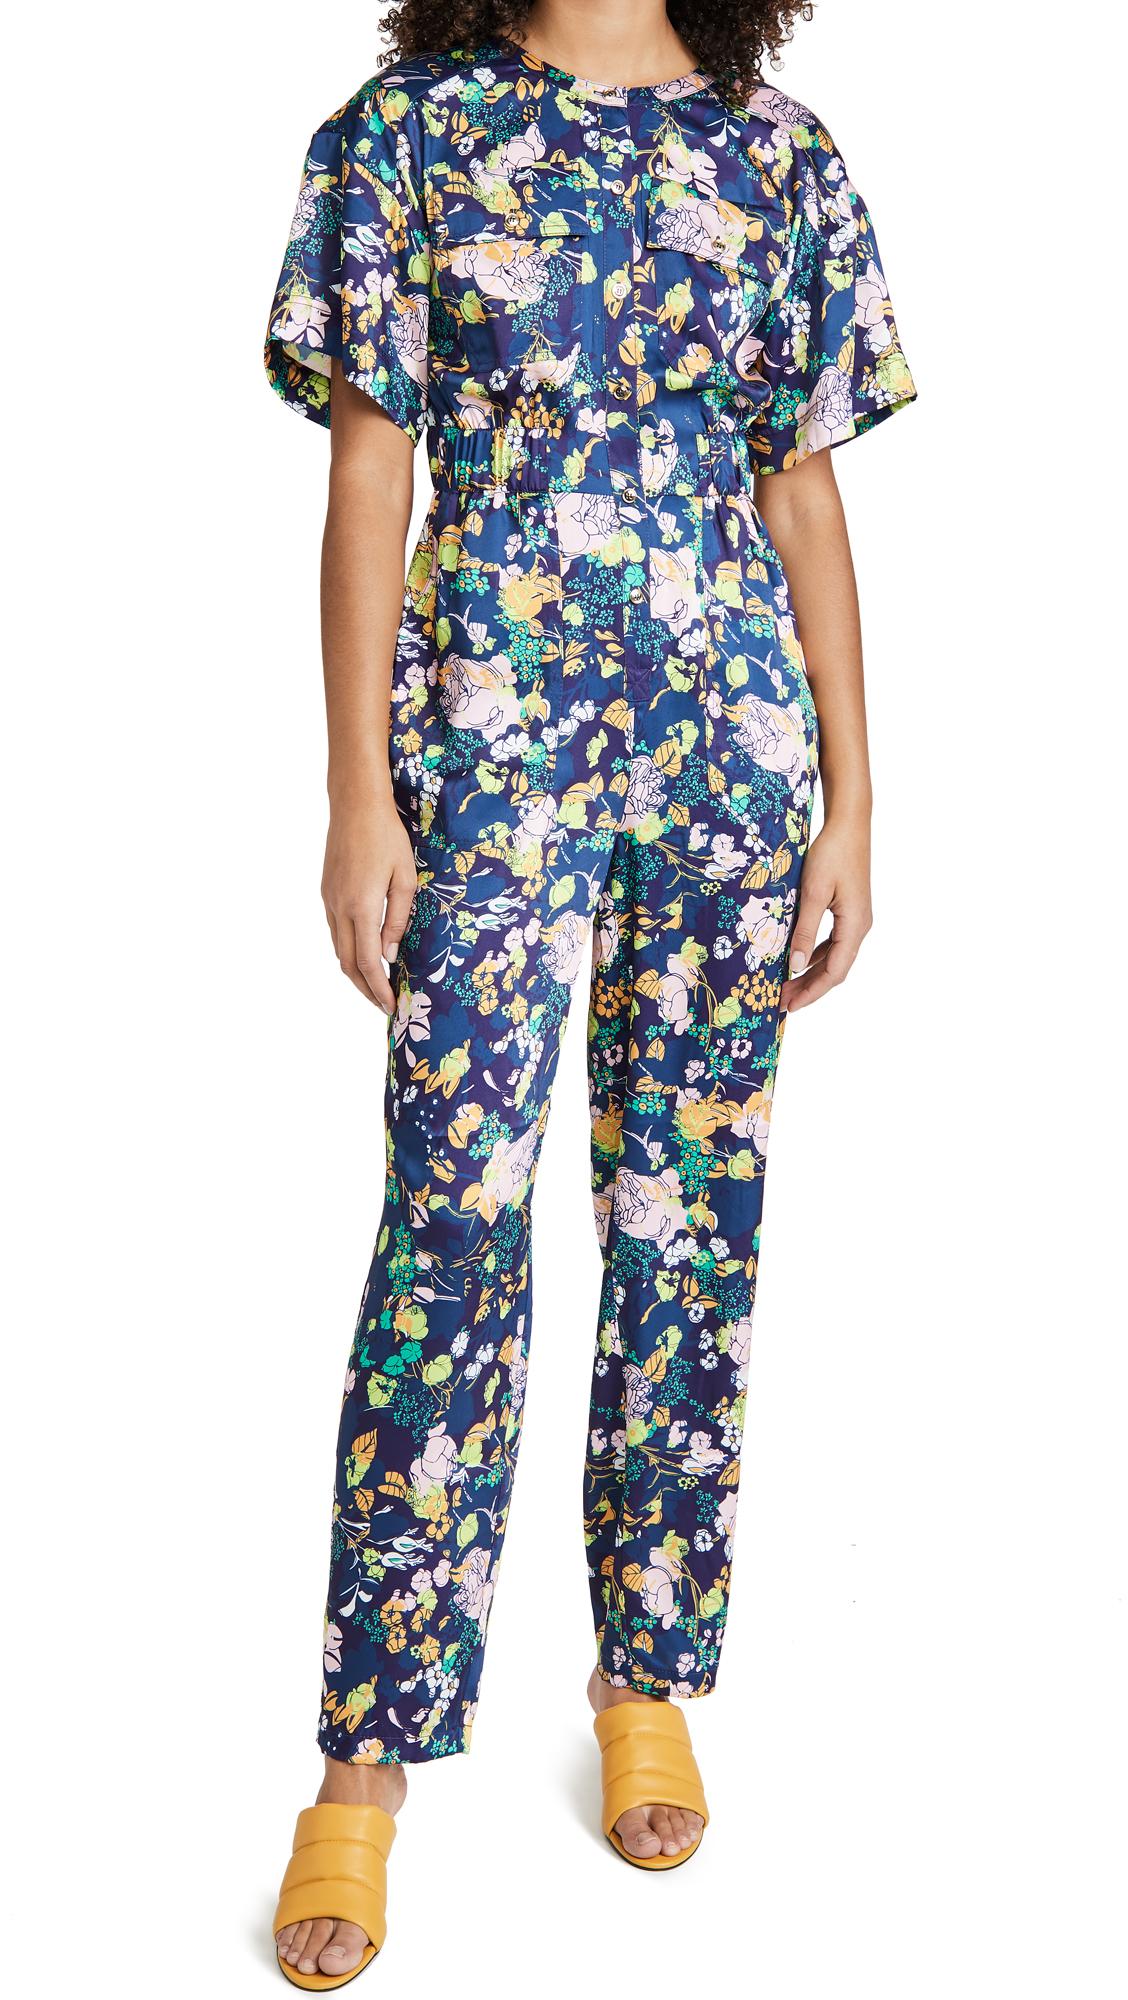 Tanya Taylor Jenni Jumpsuit In Multicolor Floral Navy Multi